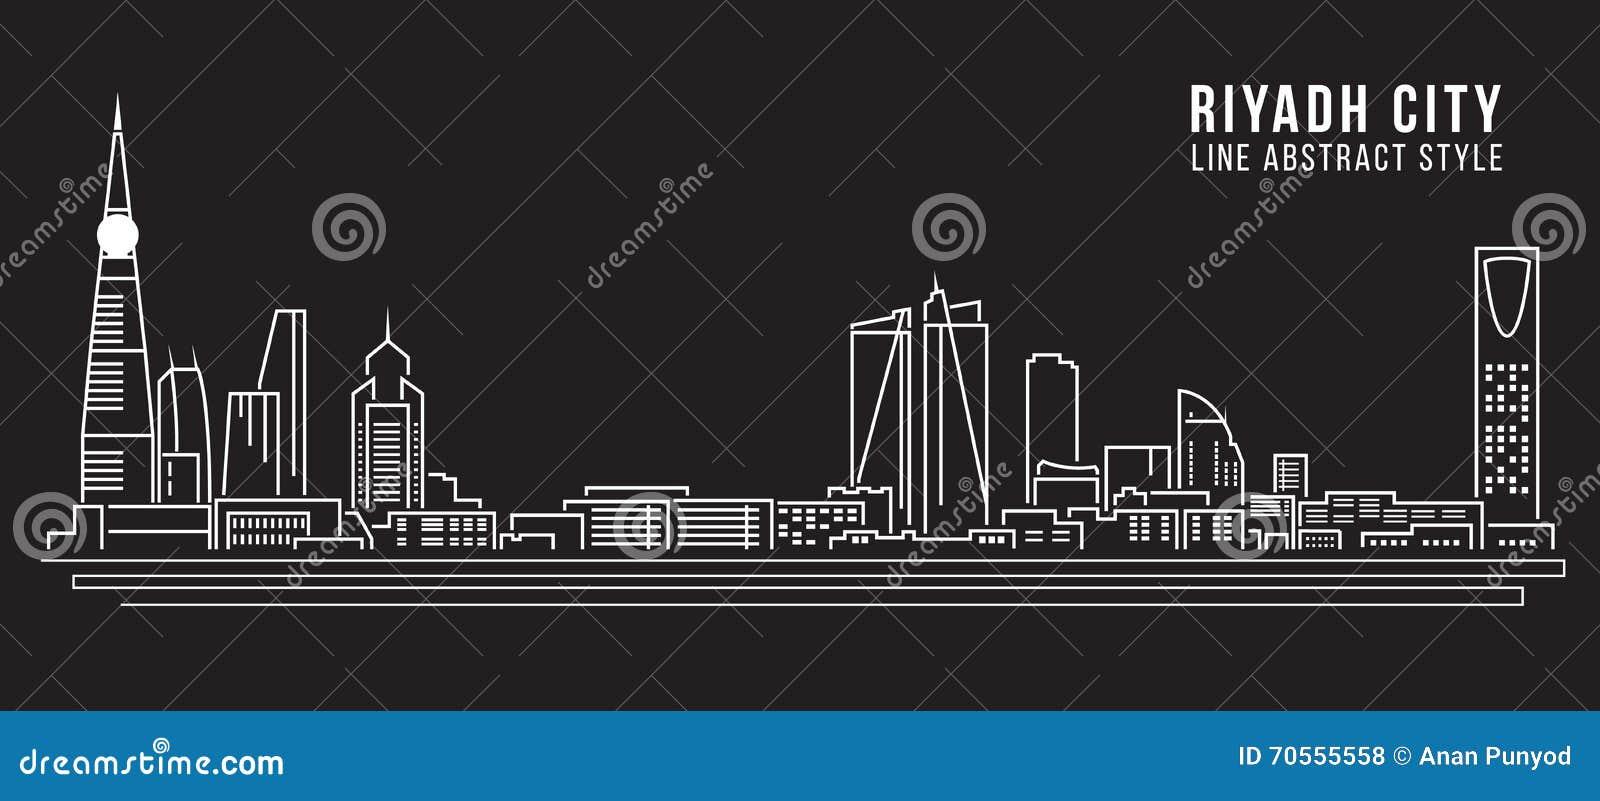 Line Art Vector Illustrator : Cityscape building line art vector illustration design riyadh